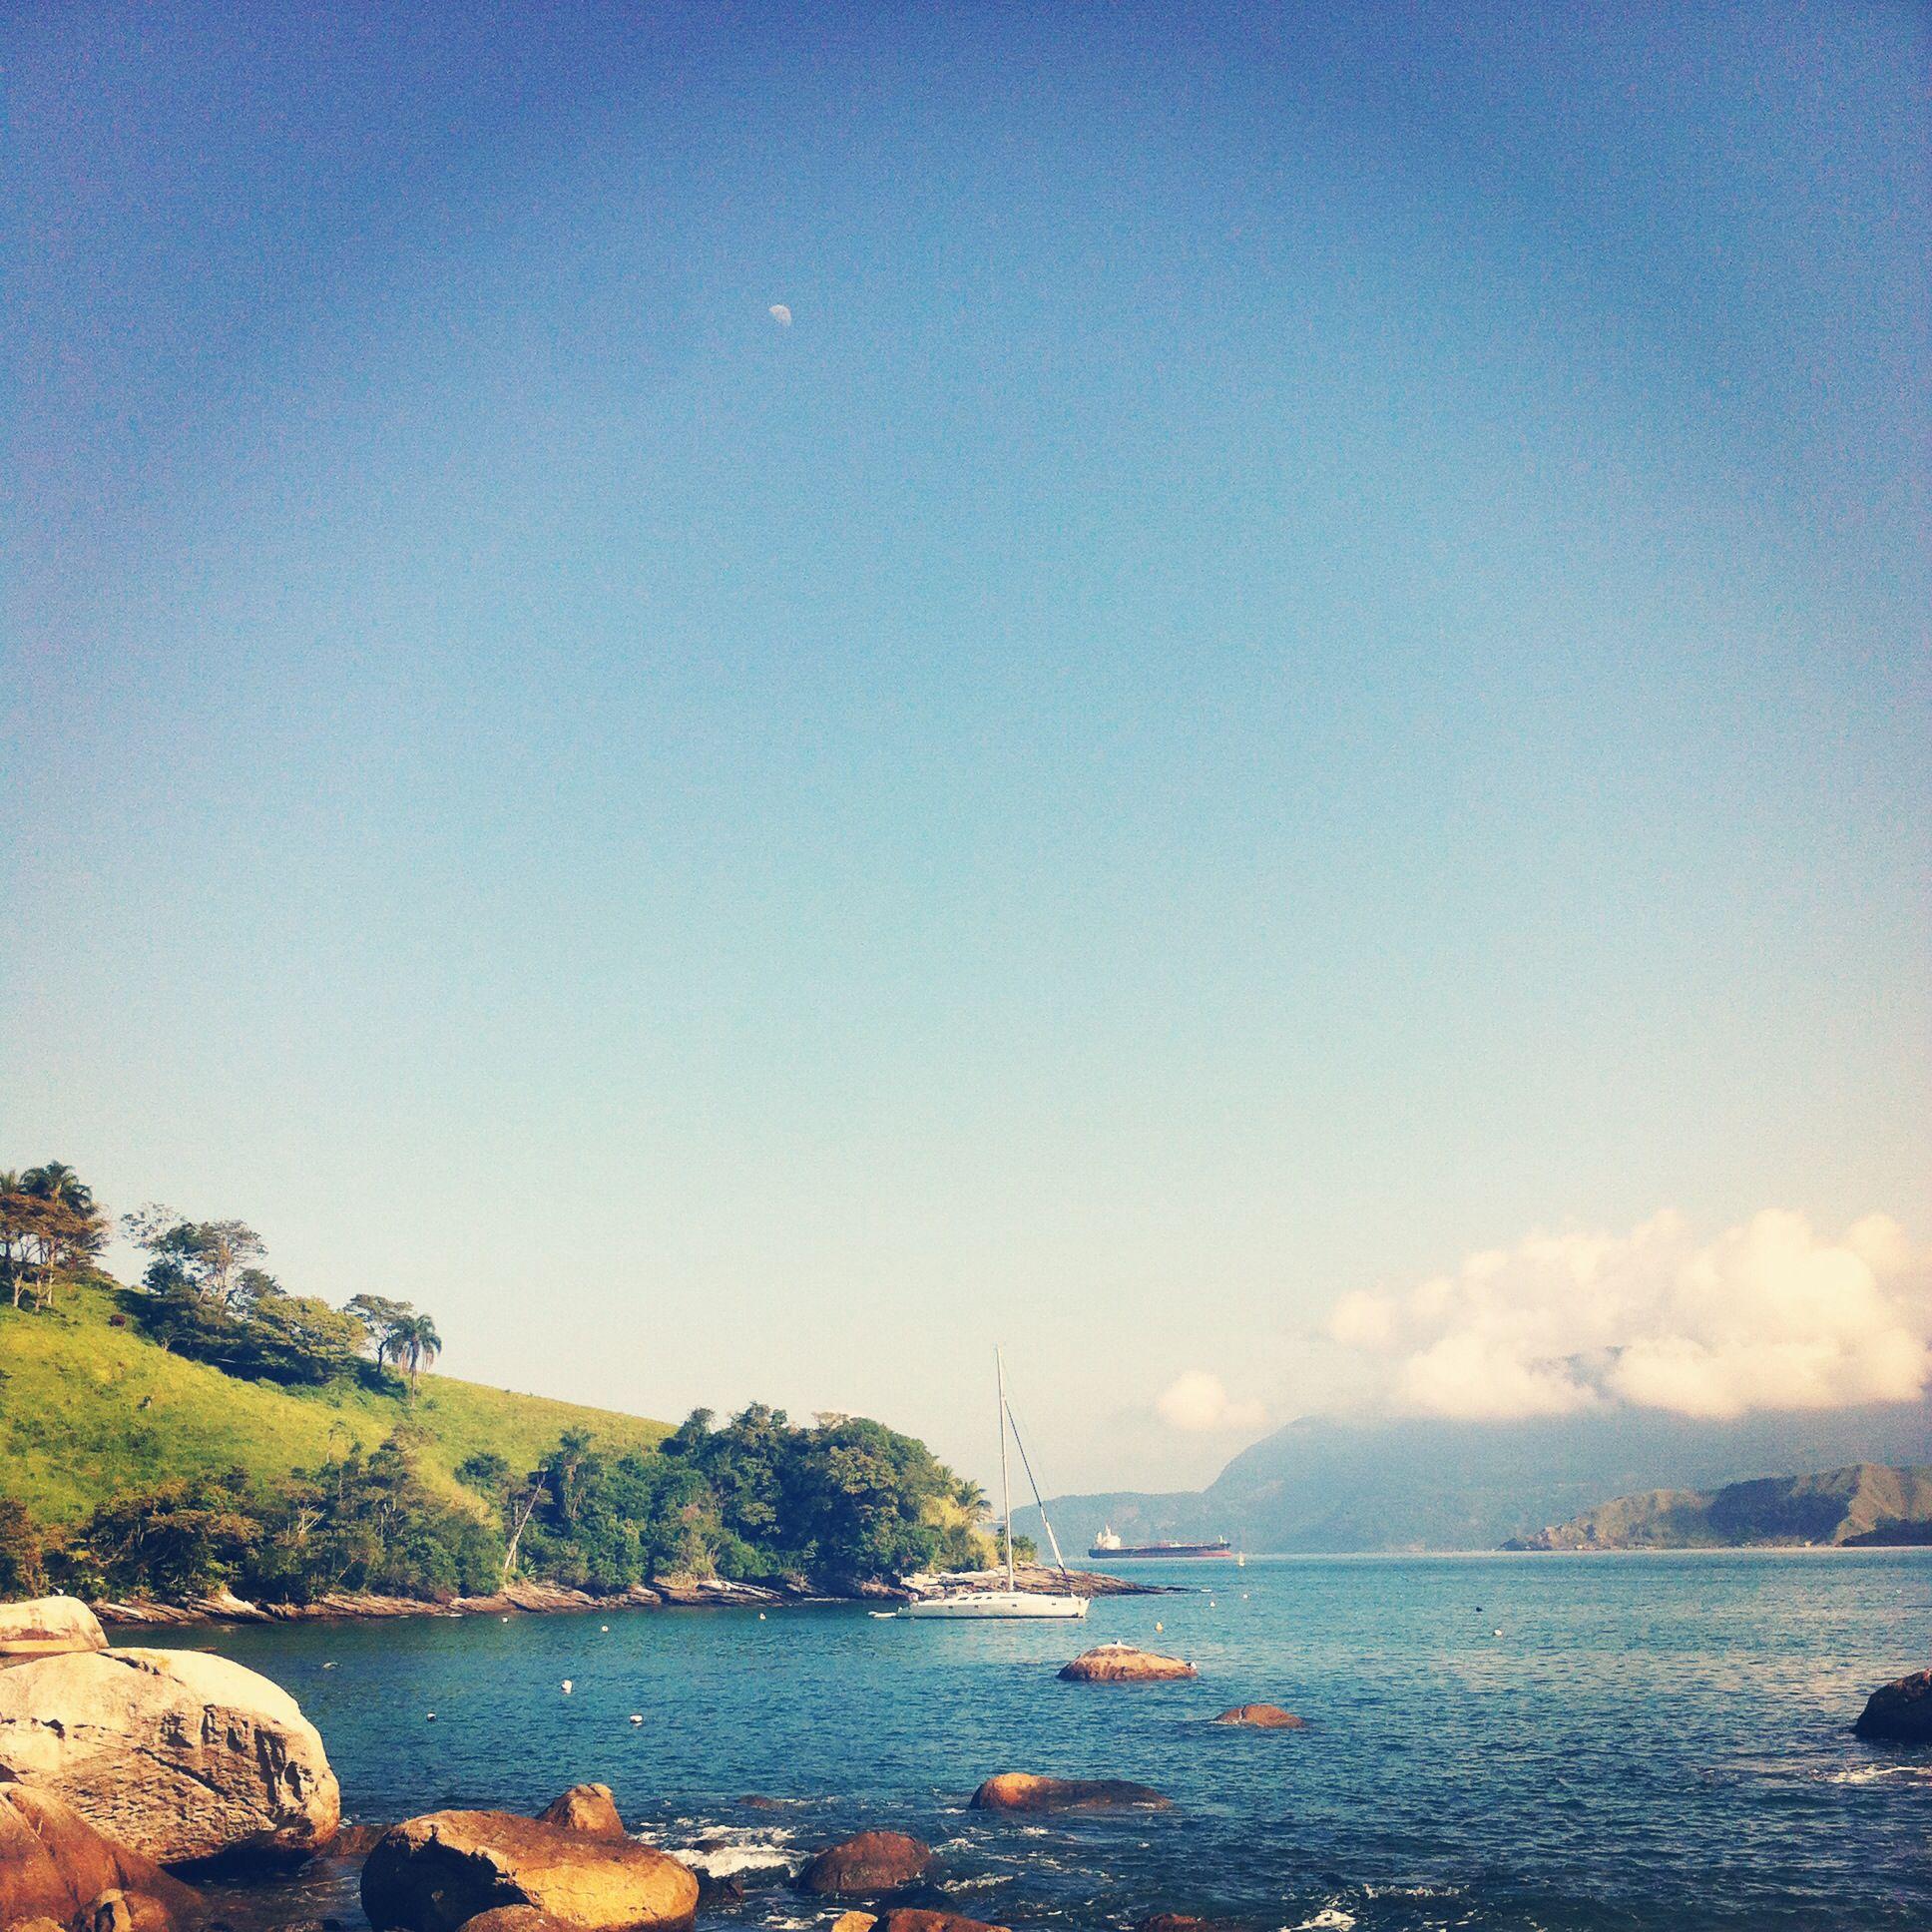 Ilha Bela